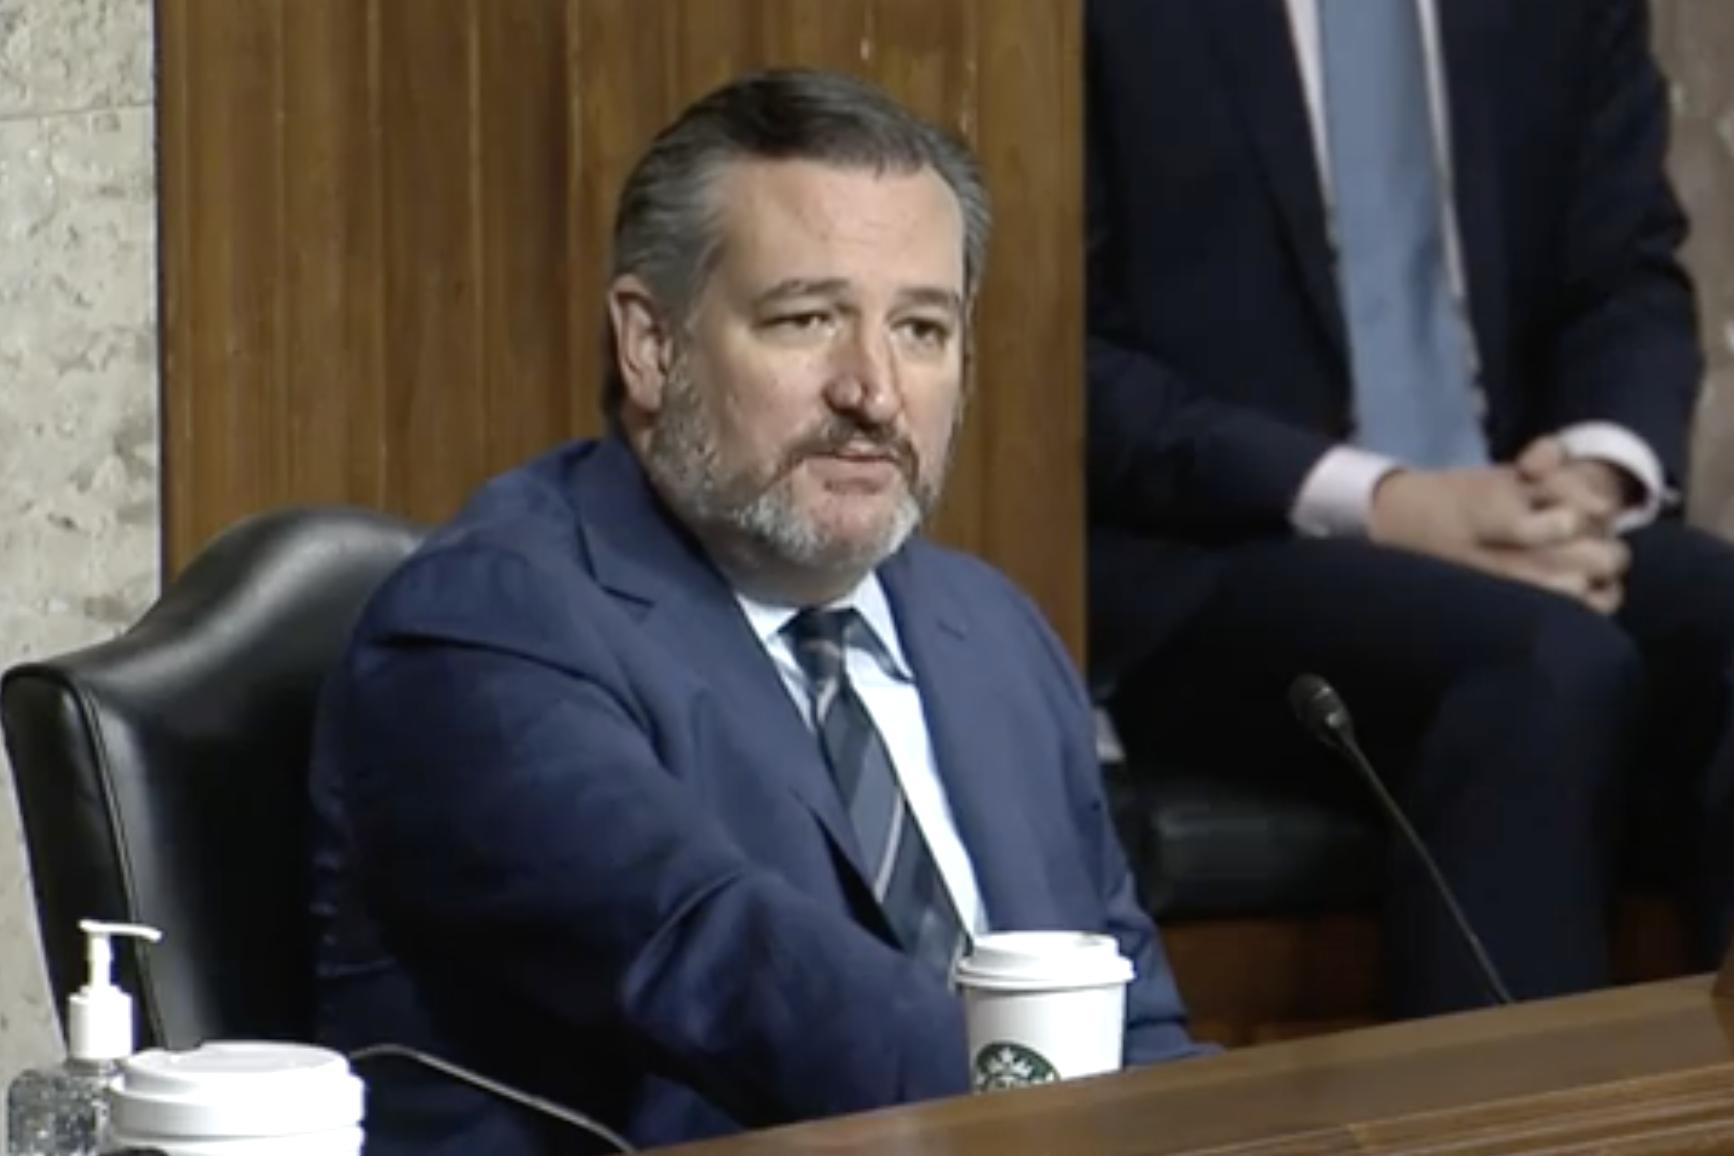 Ted Cruz Demands President Biden Allow Press Access to Border Crisis